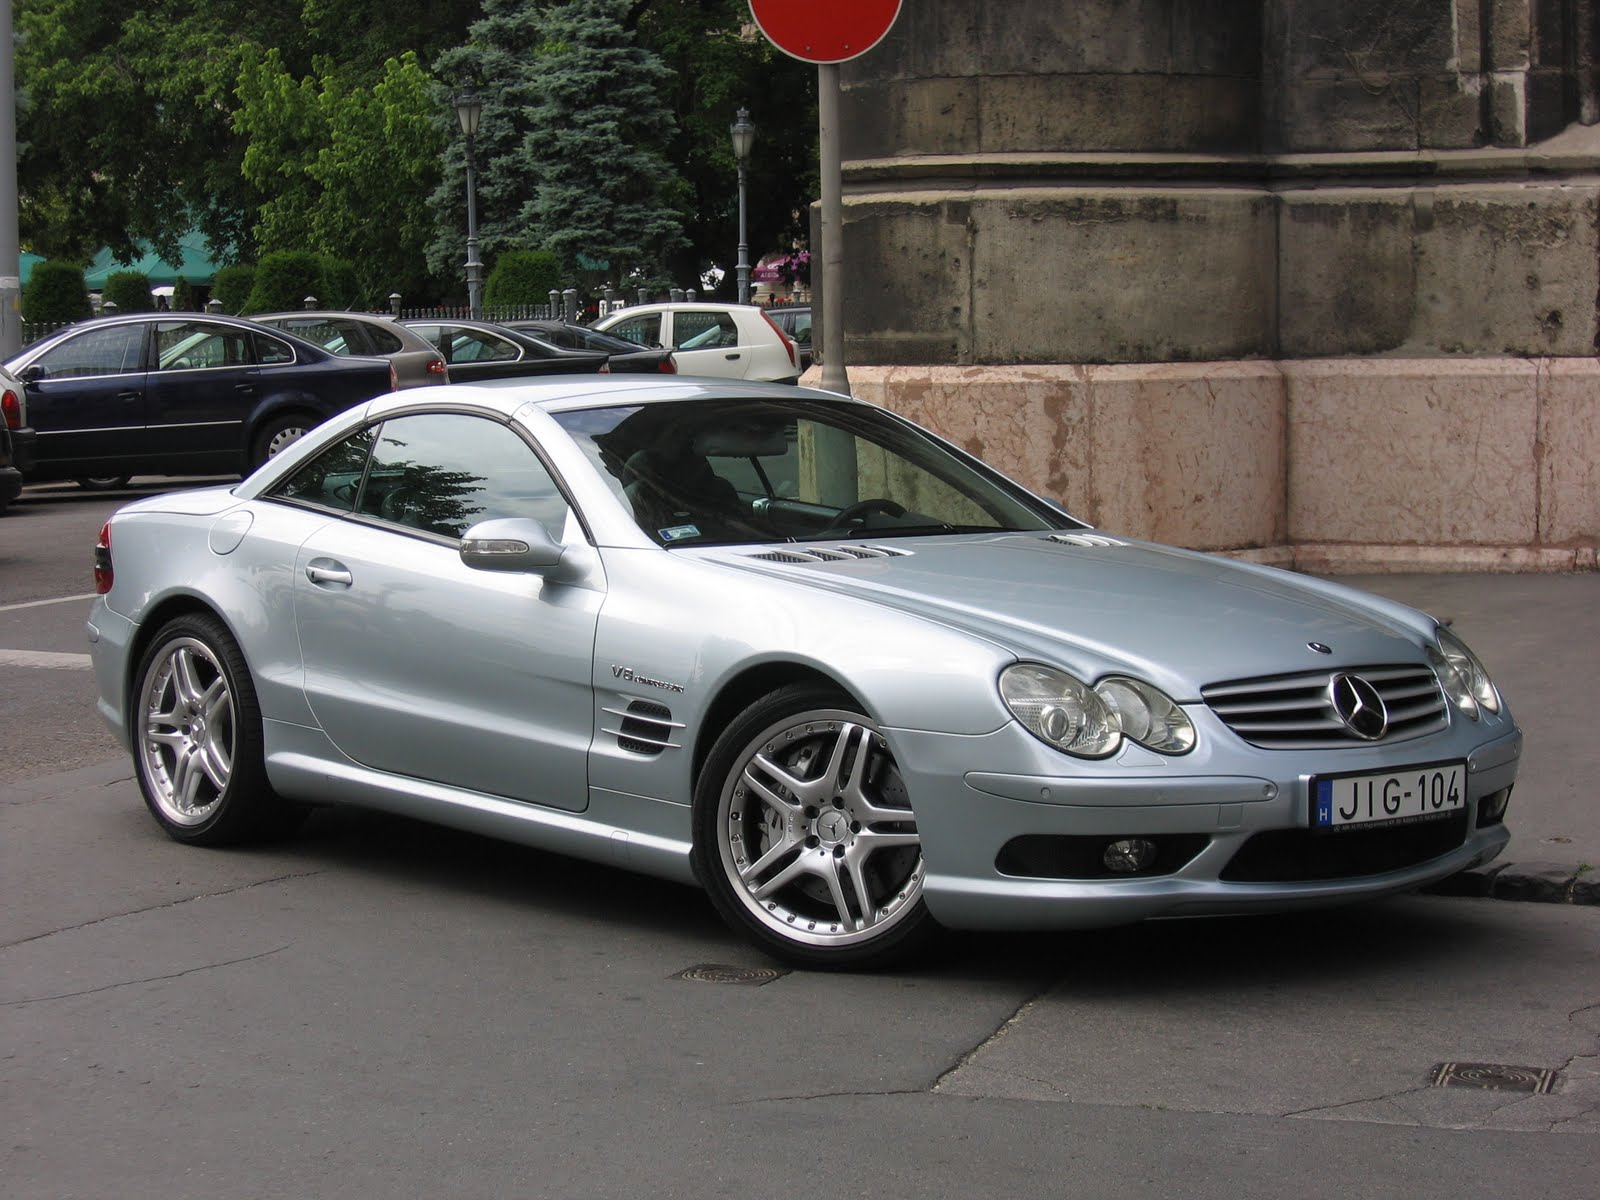 Mercedes benz SL 55 AMG